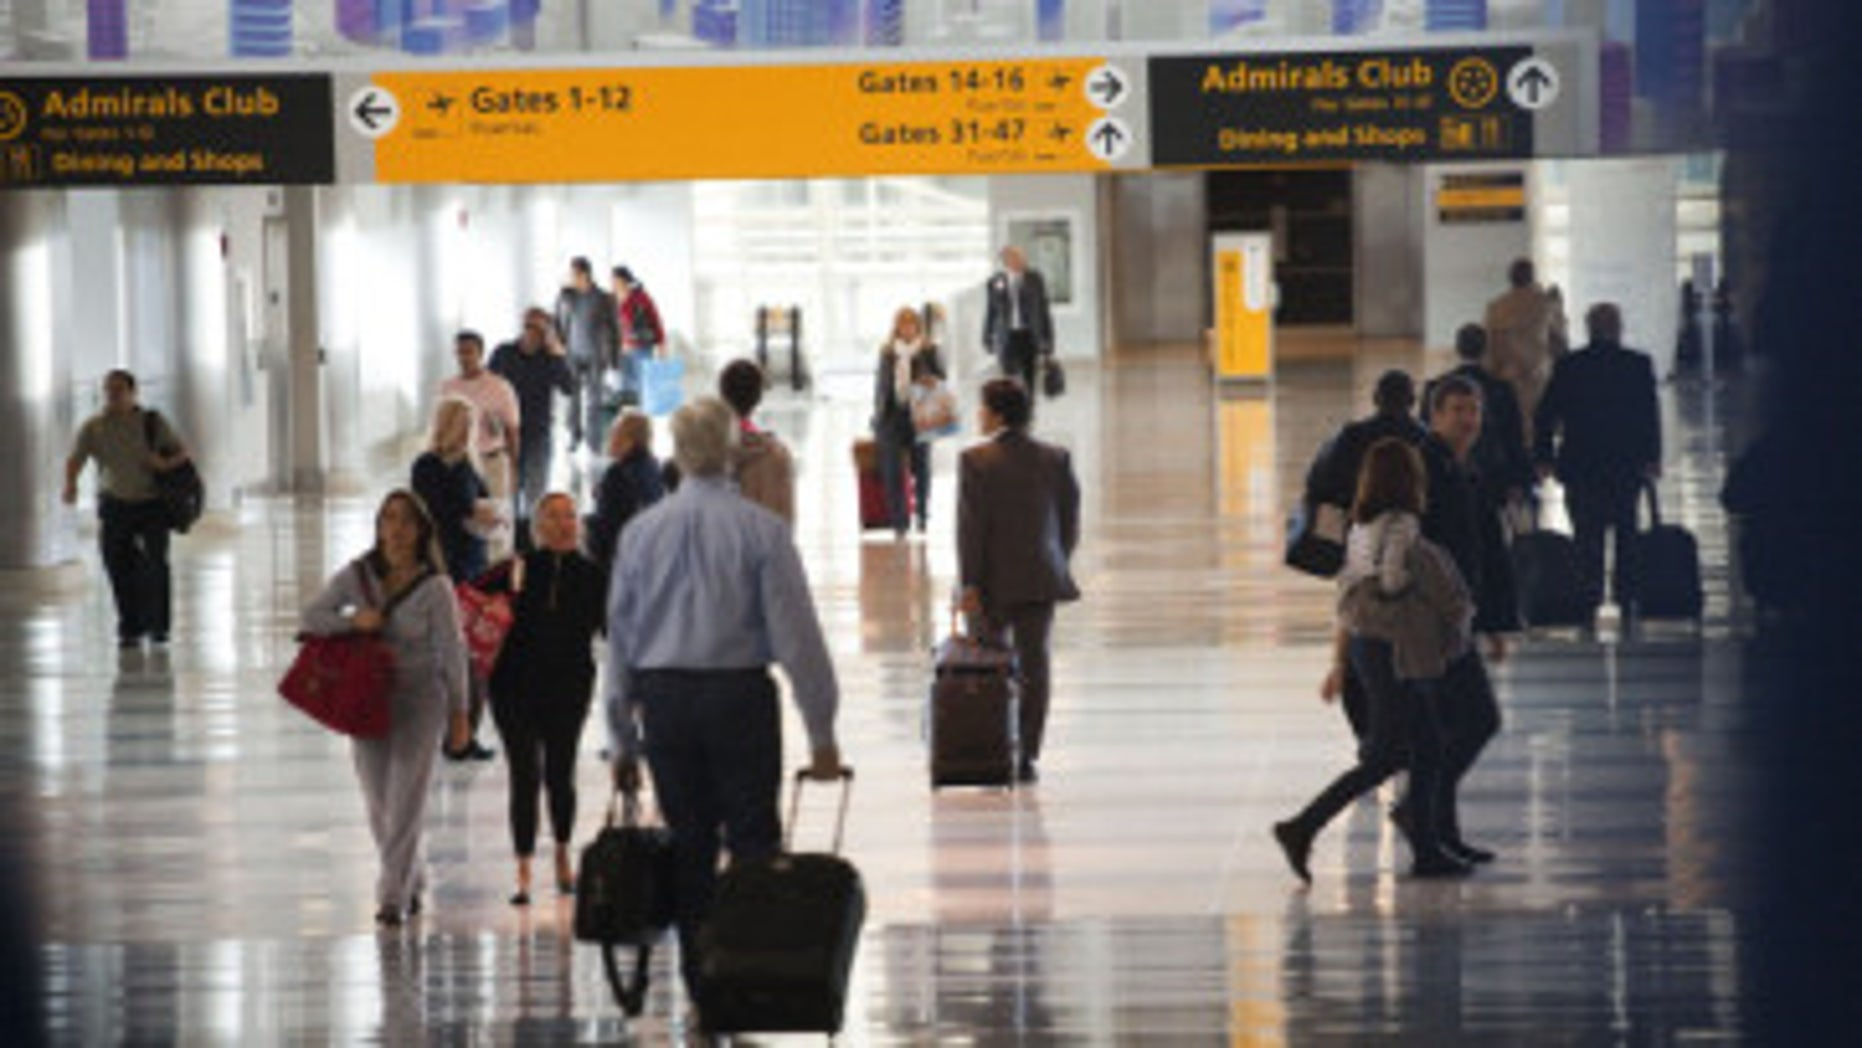 Passengers move through a JFK airport terminal.